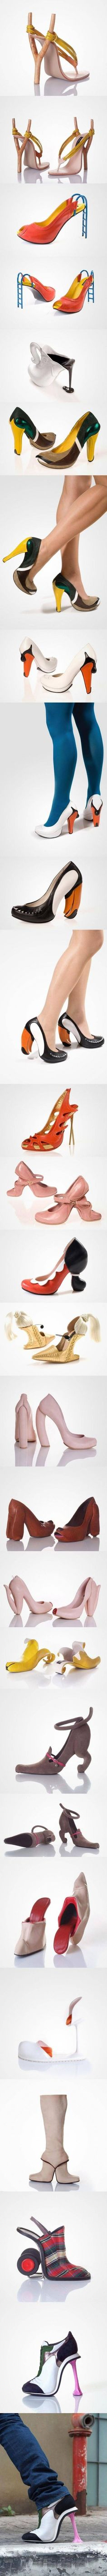 some crazy shoes